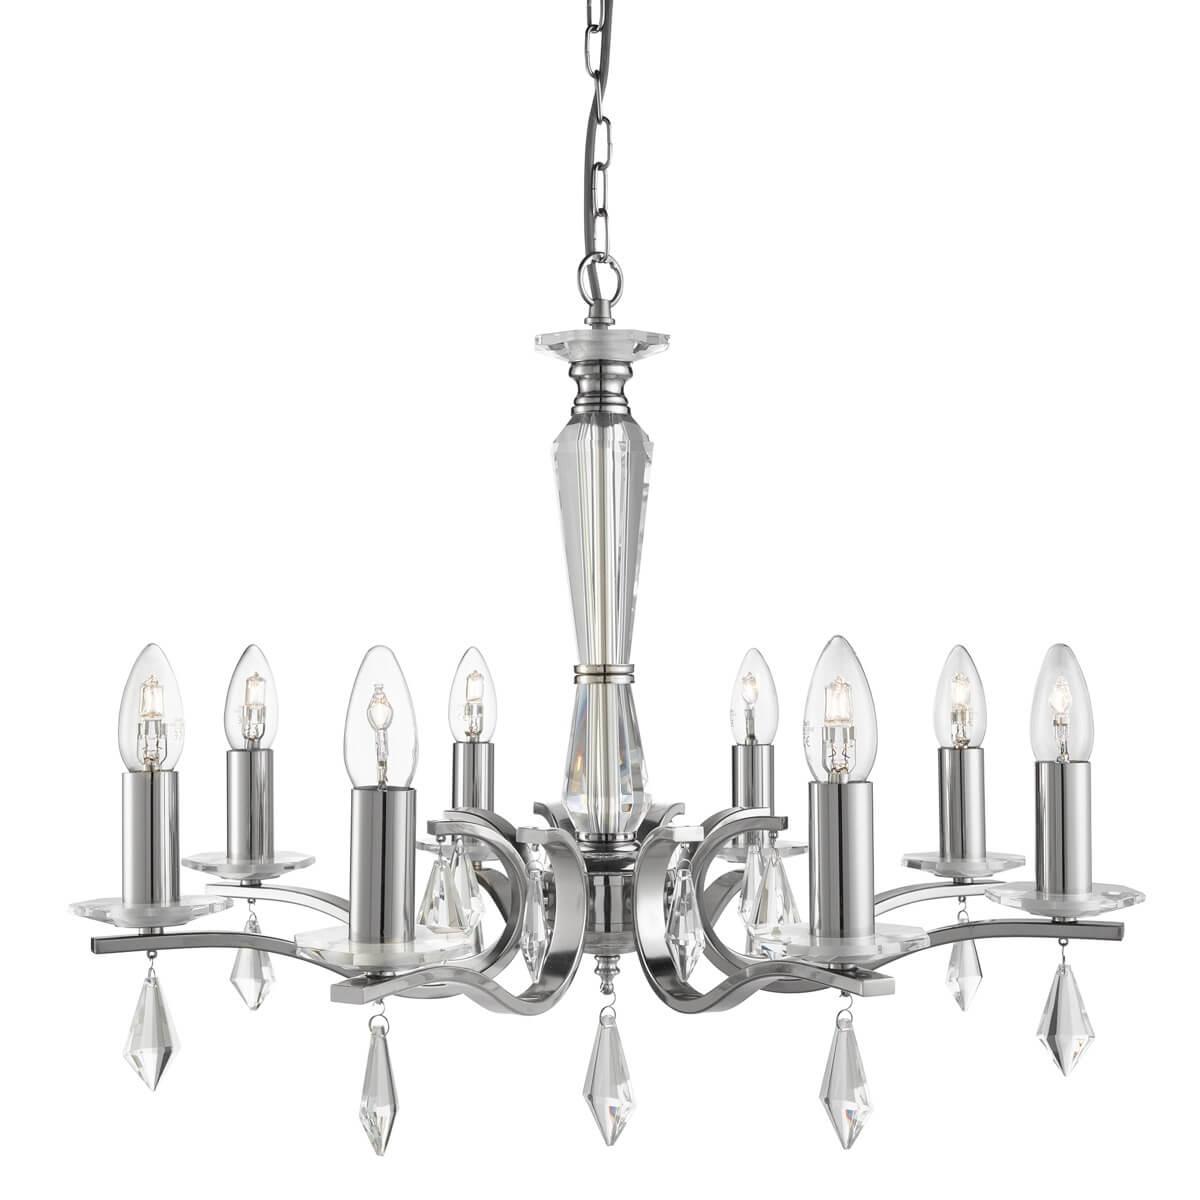 Royale 8 Light Ceiling Satin Silver Hexagonal Clear